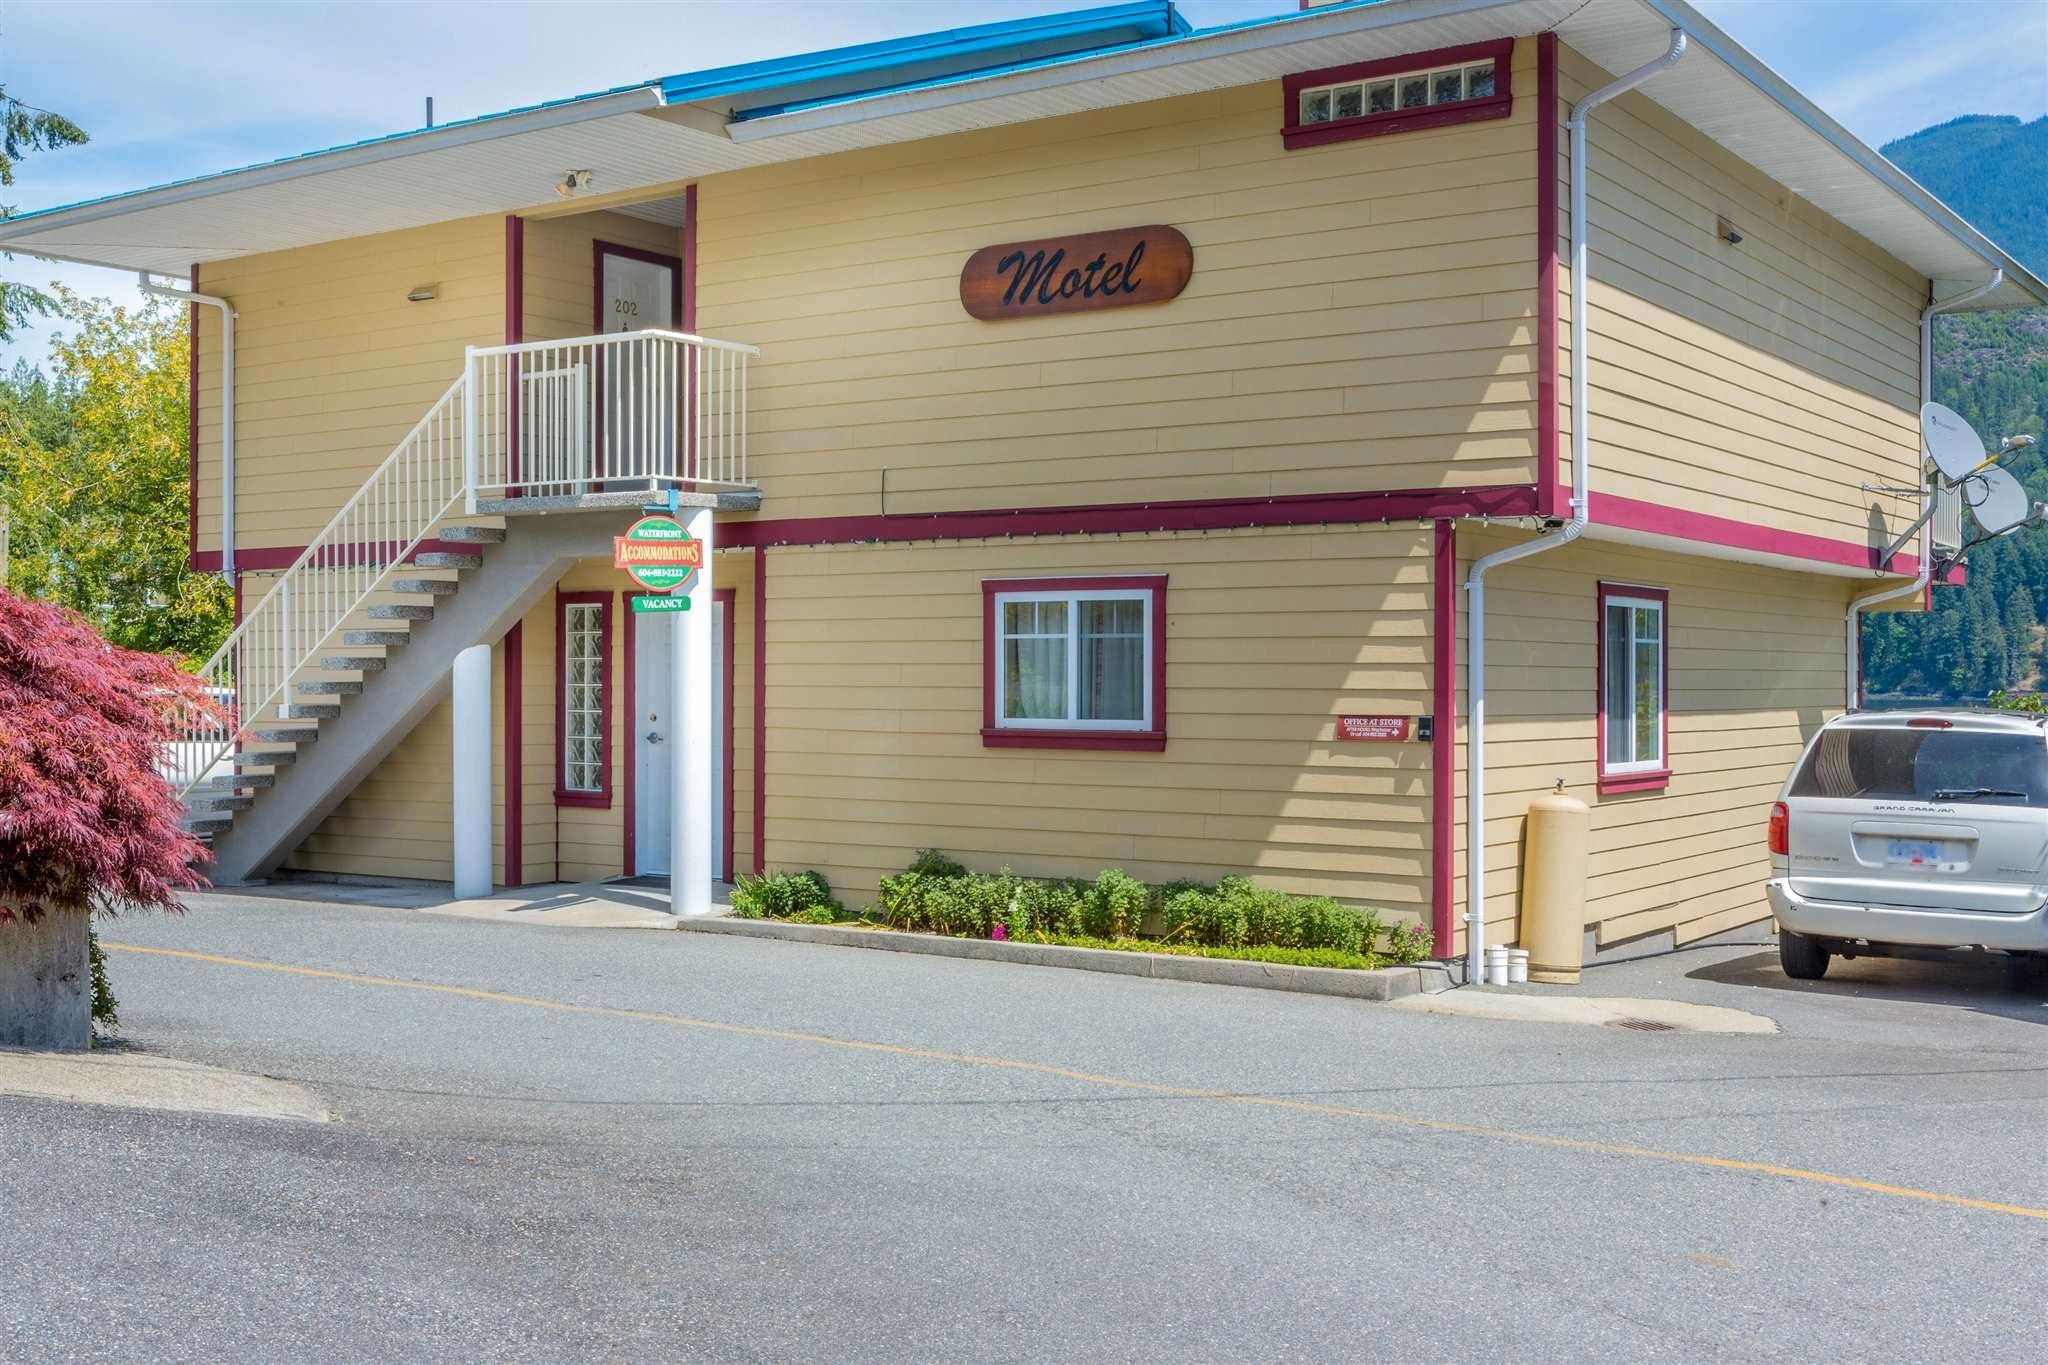 Photo 7: Photos: 6781 BATHGATE Road in Egmont: Pender Harbour Egmont House for sale (Sunshine Coast)  : MLS®# R2593981